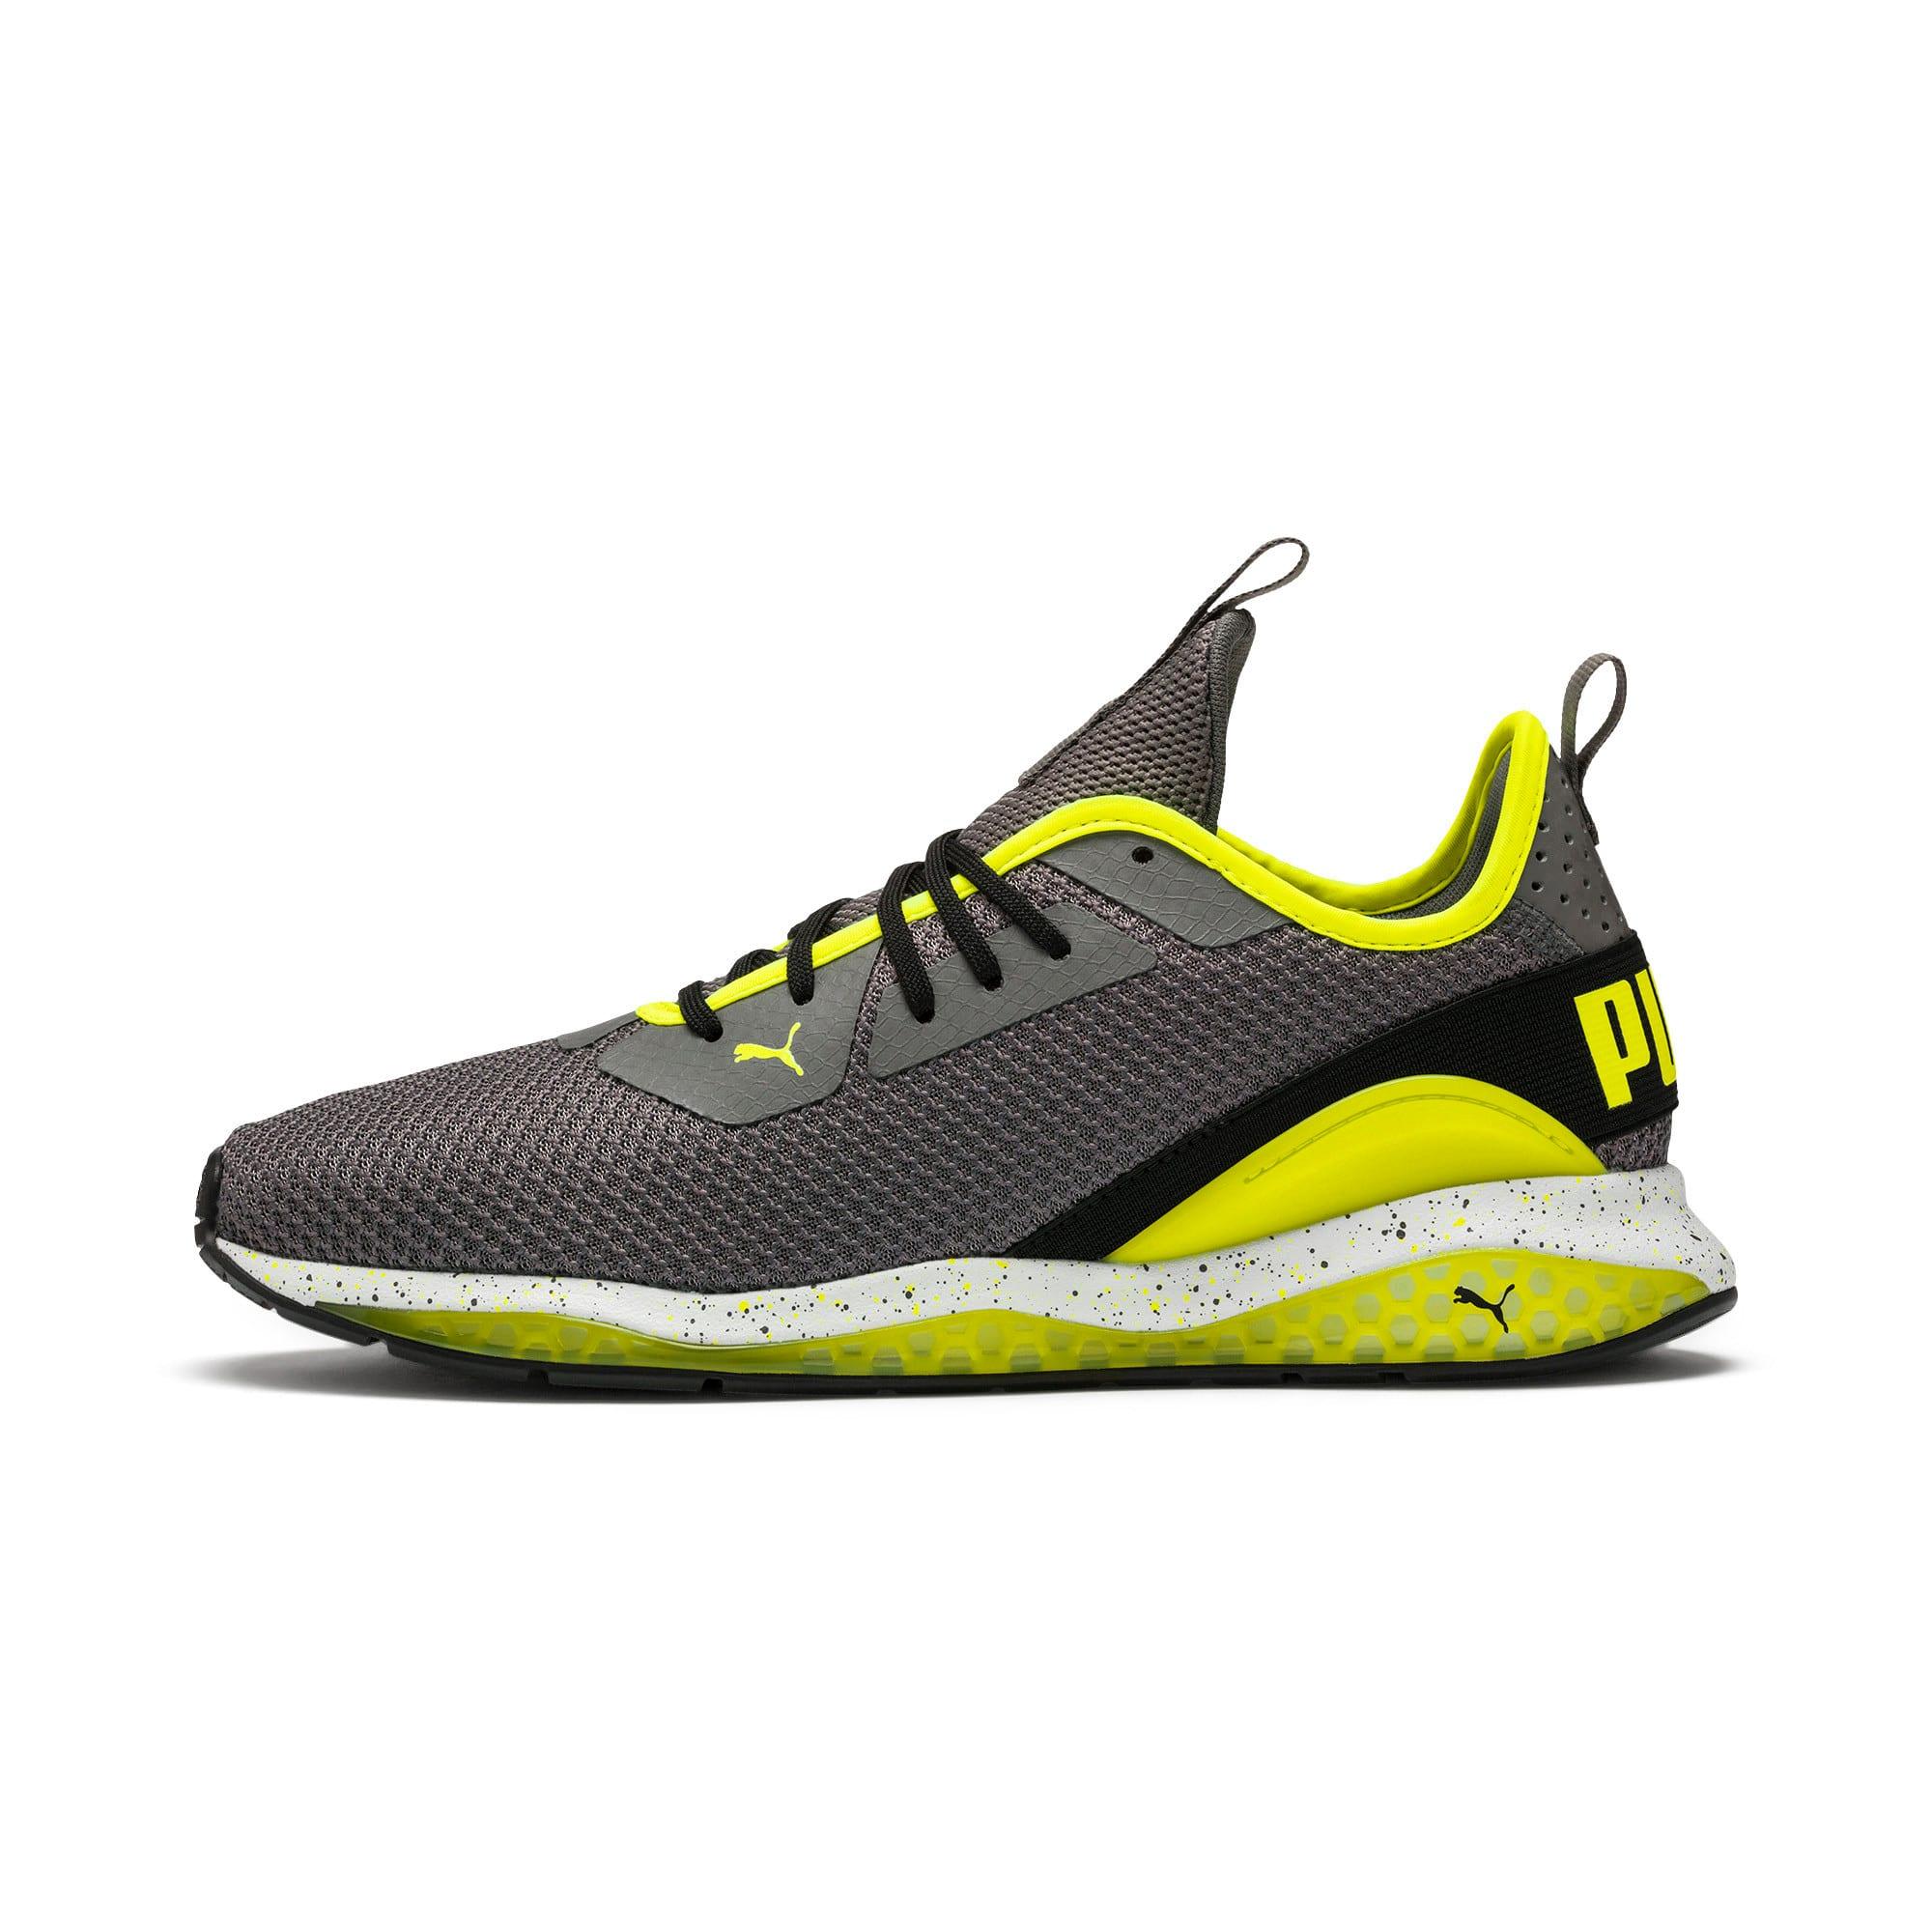 Thumbnail 1 of CELL Descend Weave Men's Training Shoes, CASTLEROCK-Black-Yellow, medium